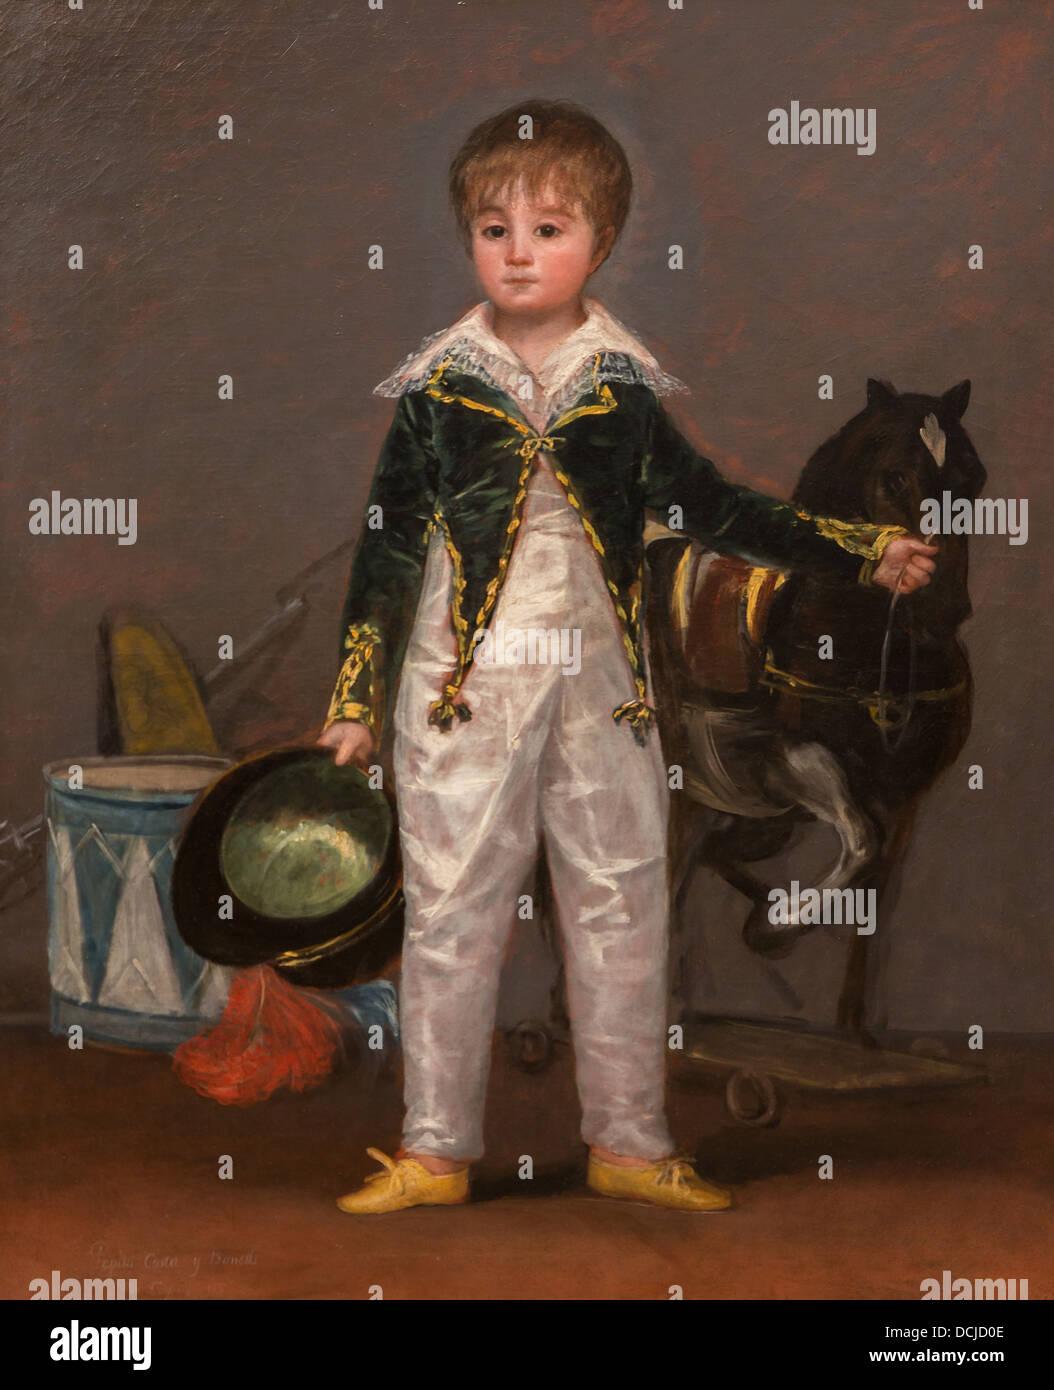 19. Jahrhundert - Jose Costa y Bonells, 1810 - Goya Philippe Sauvan-Magnet / aktive Museum Stockbild